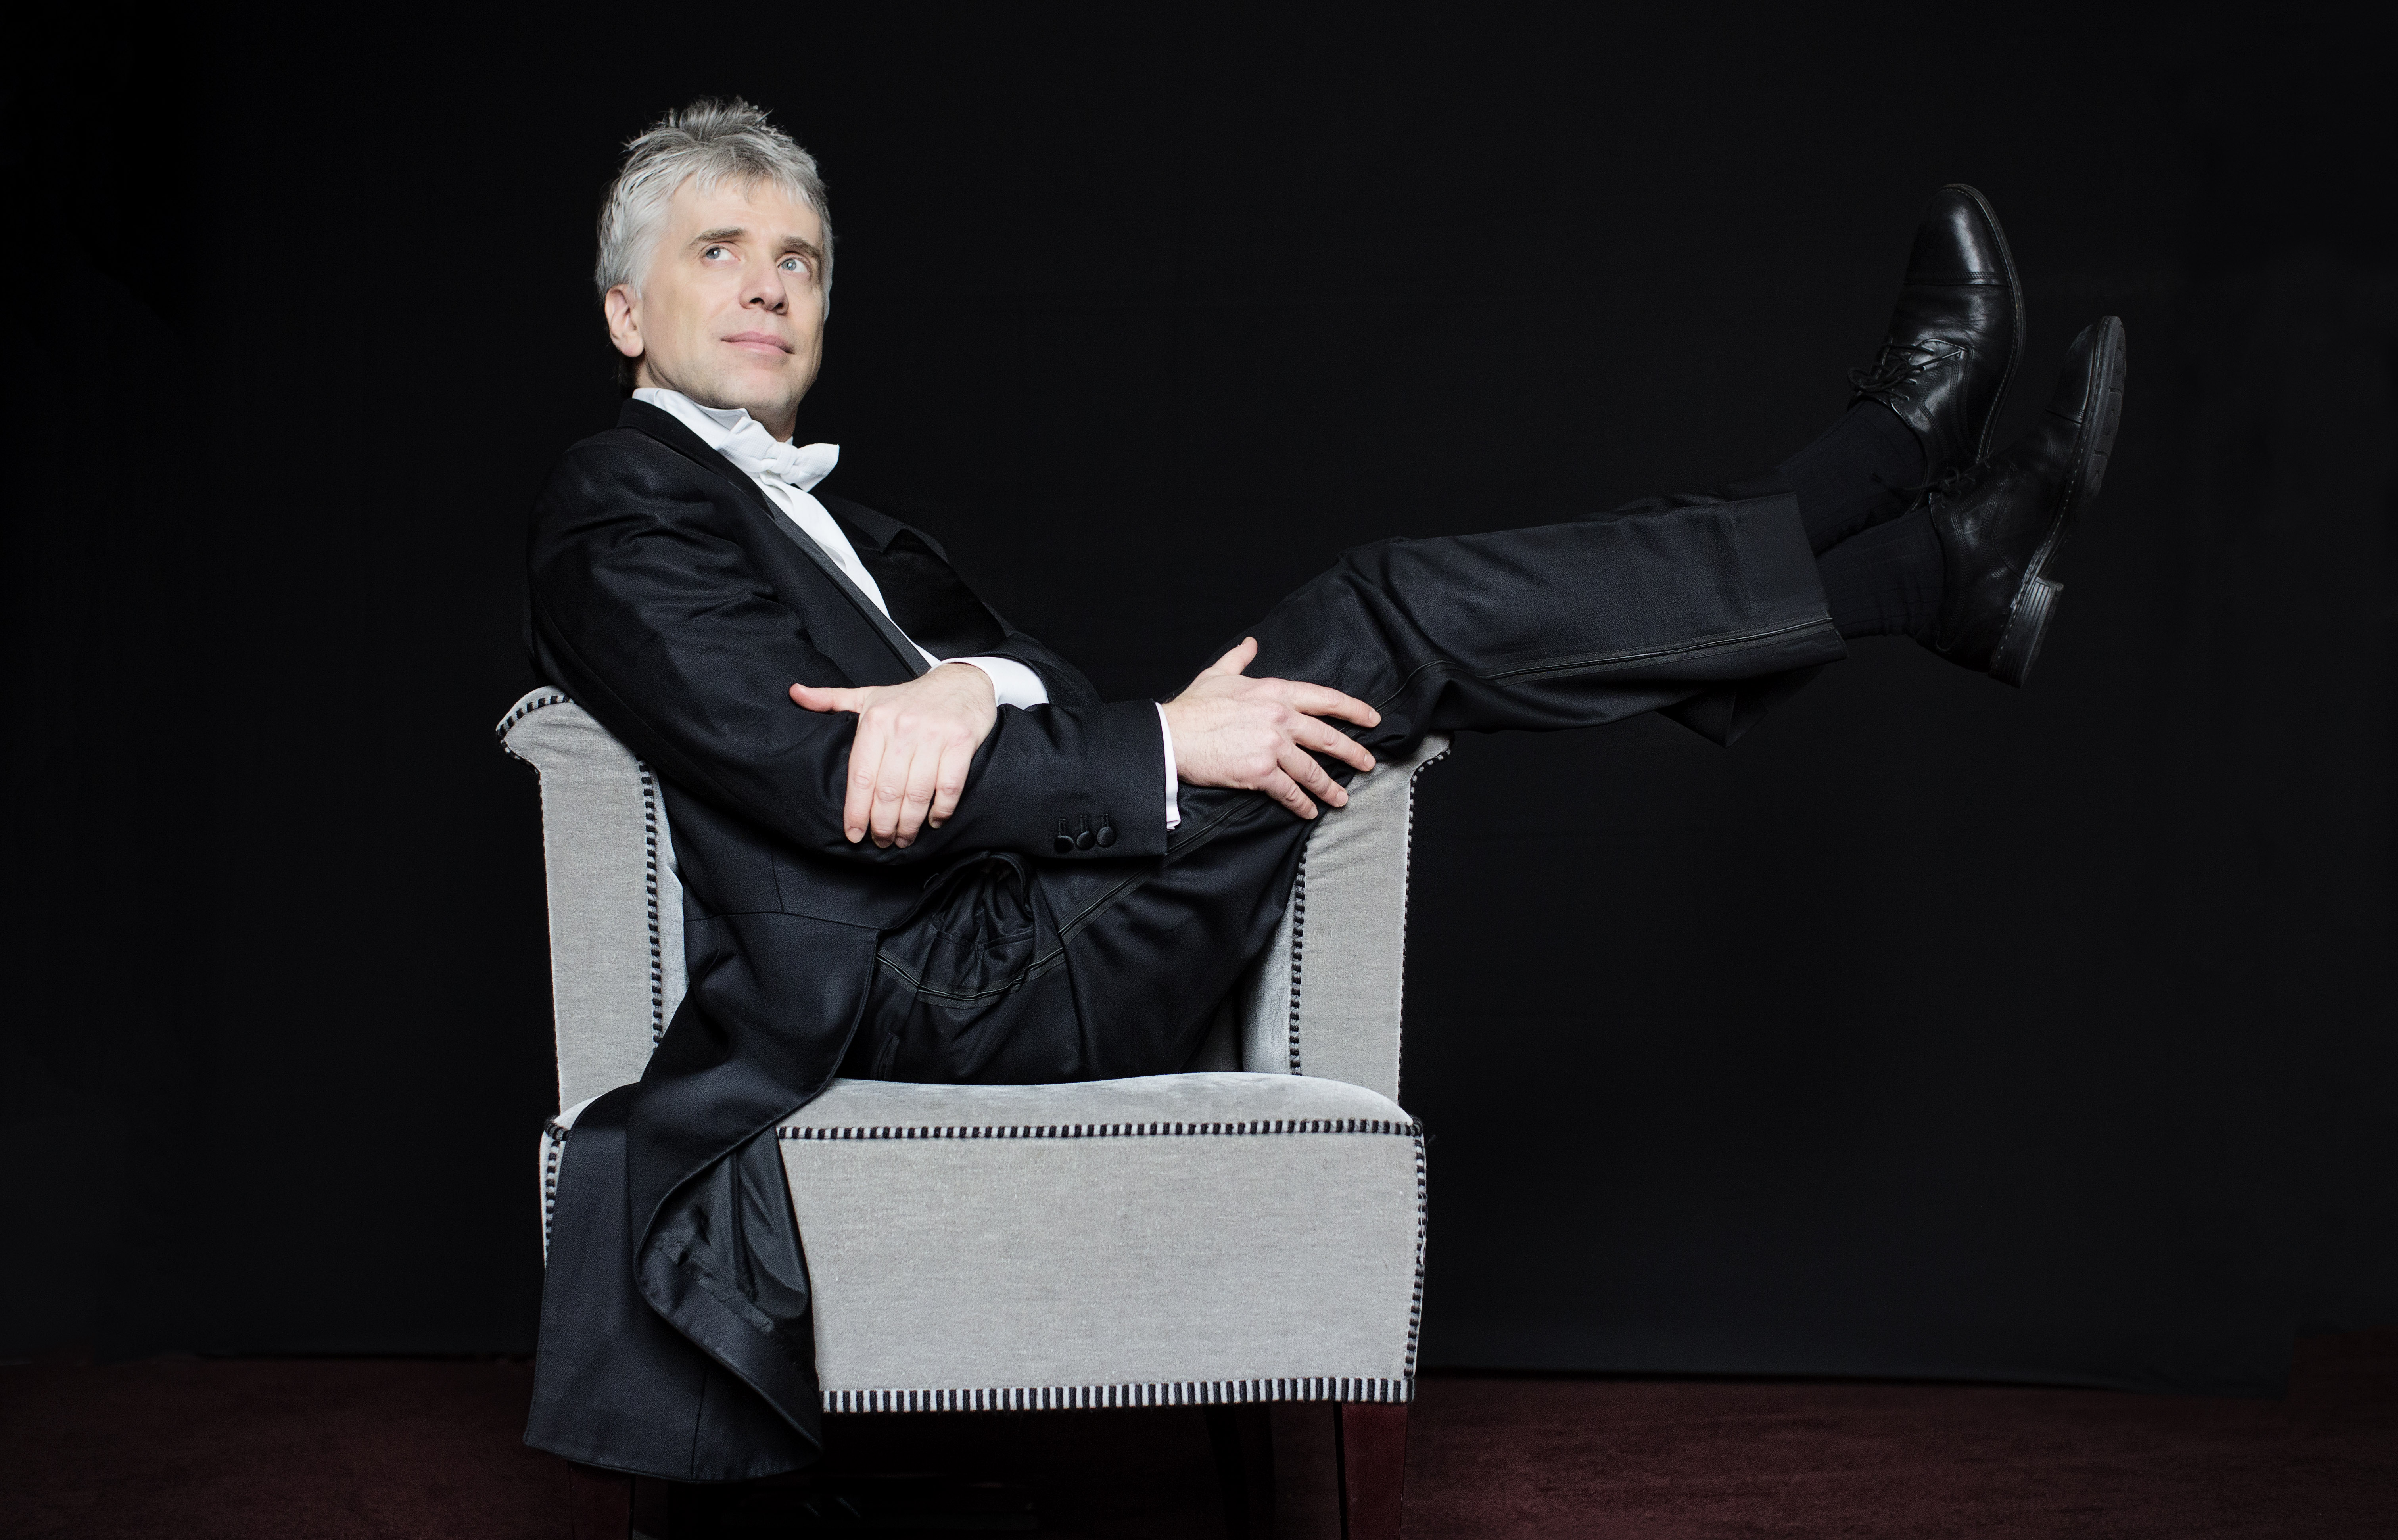 2022-03-20. Suites orquestales de Bach. Giovanni Antonini. CNDM